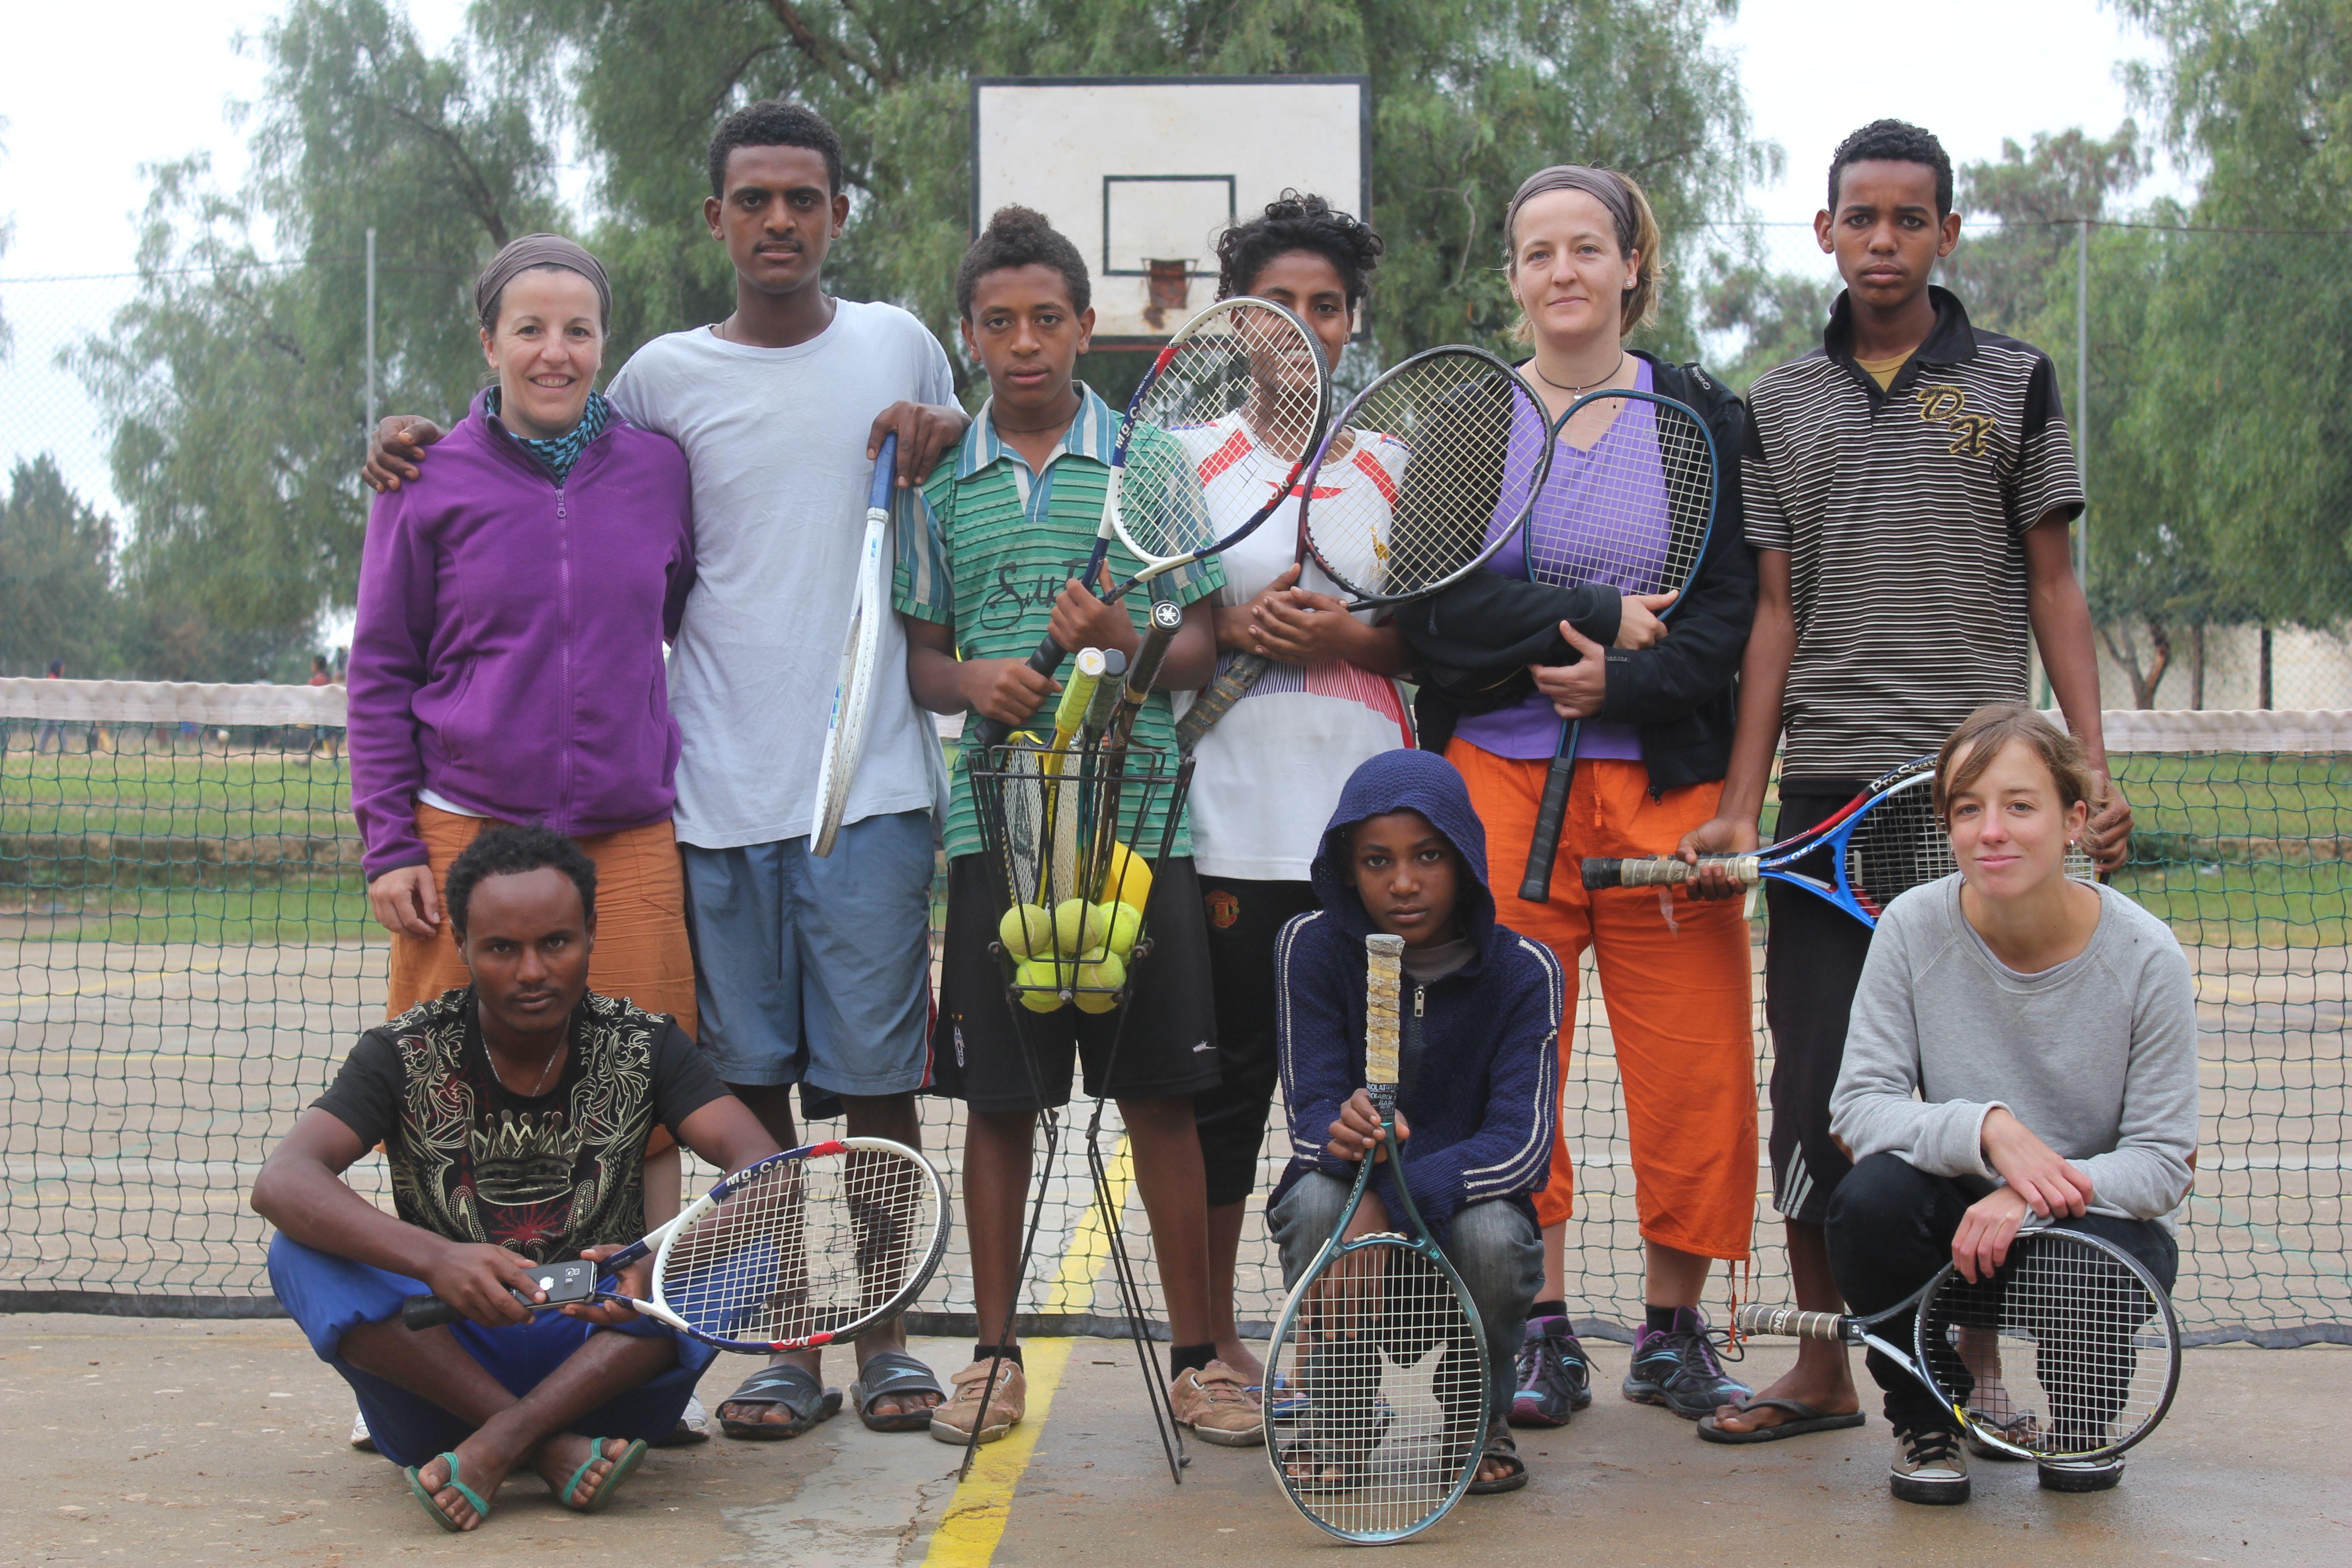 Escuela Tenis II